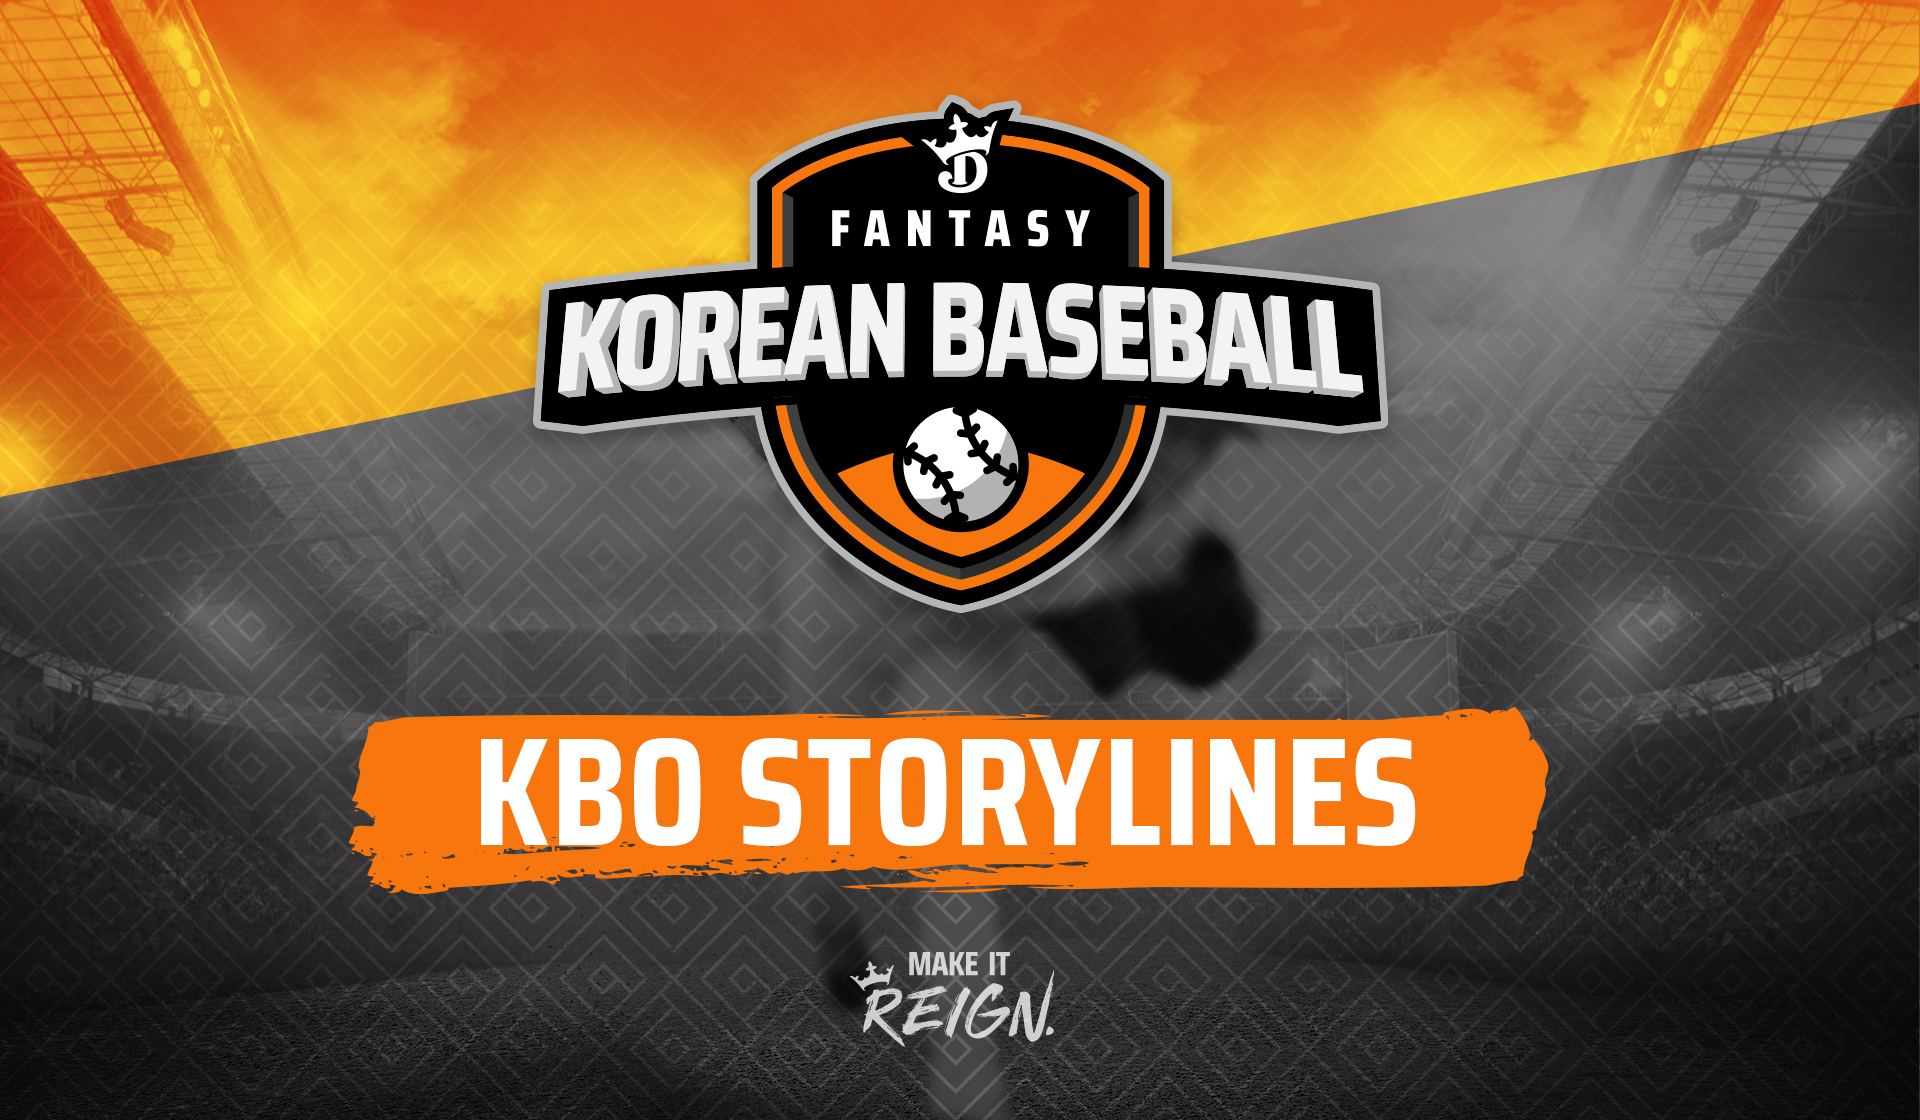 KBO Storylines